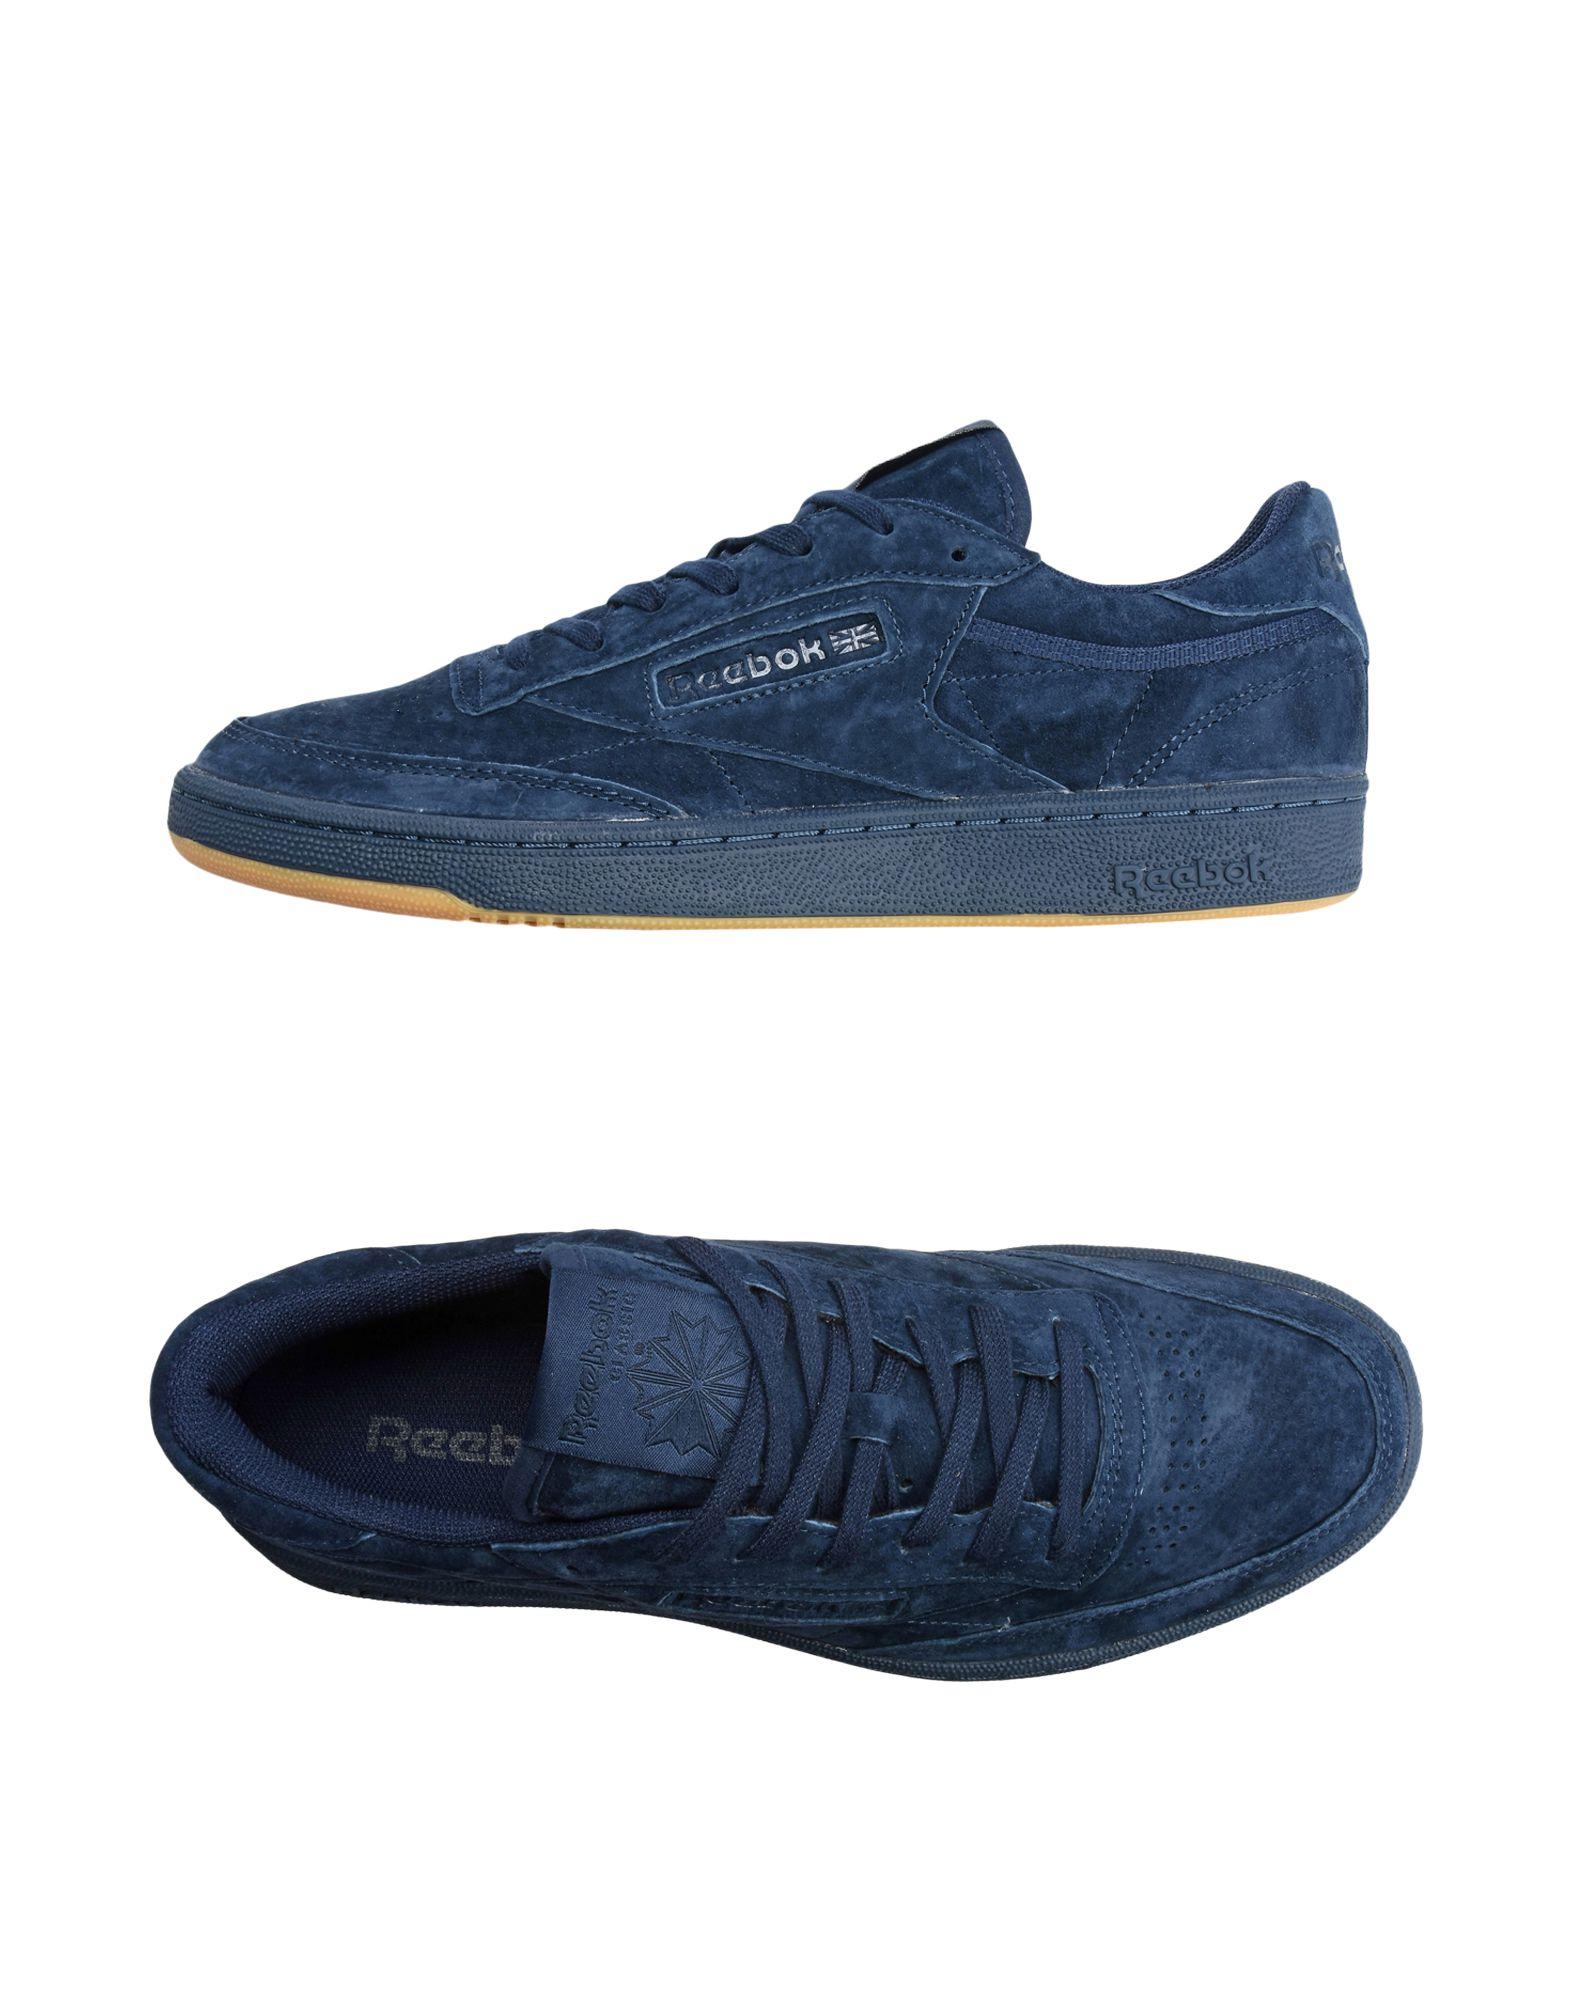 Sneakers Reebok Club C 85 Tg - Uomo - 11215689US